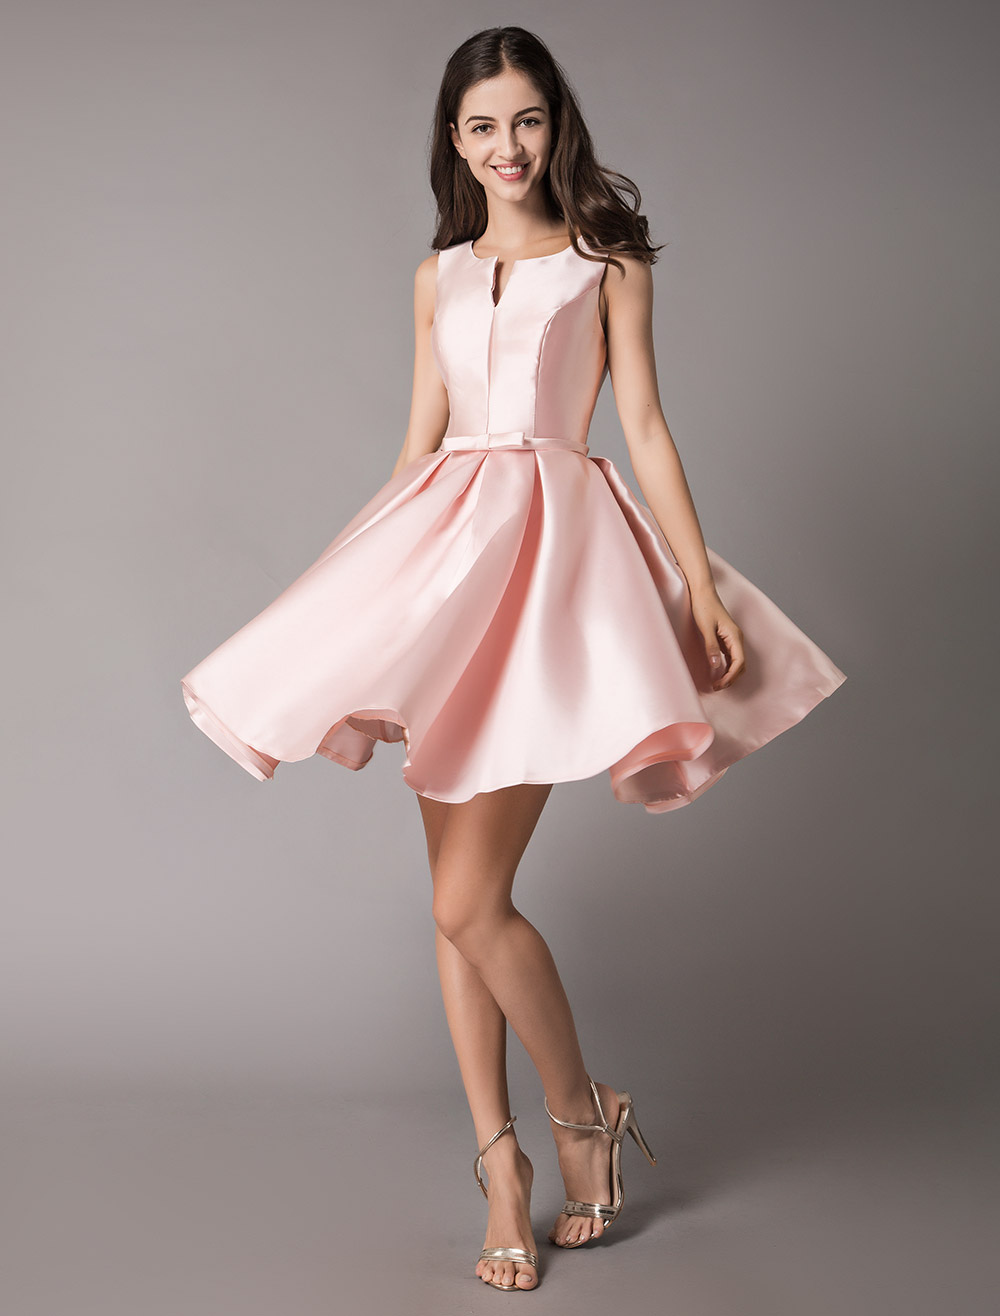 b2b8225a863fb1 ... Satin Cocktail Dresses Soft Pink A Line Sleeveless Short Prom Dress-No.5  ...